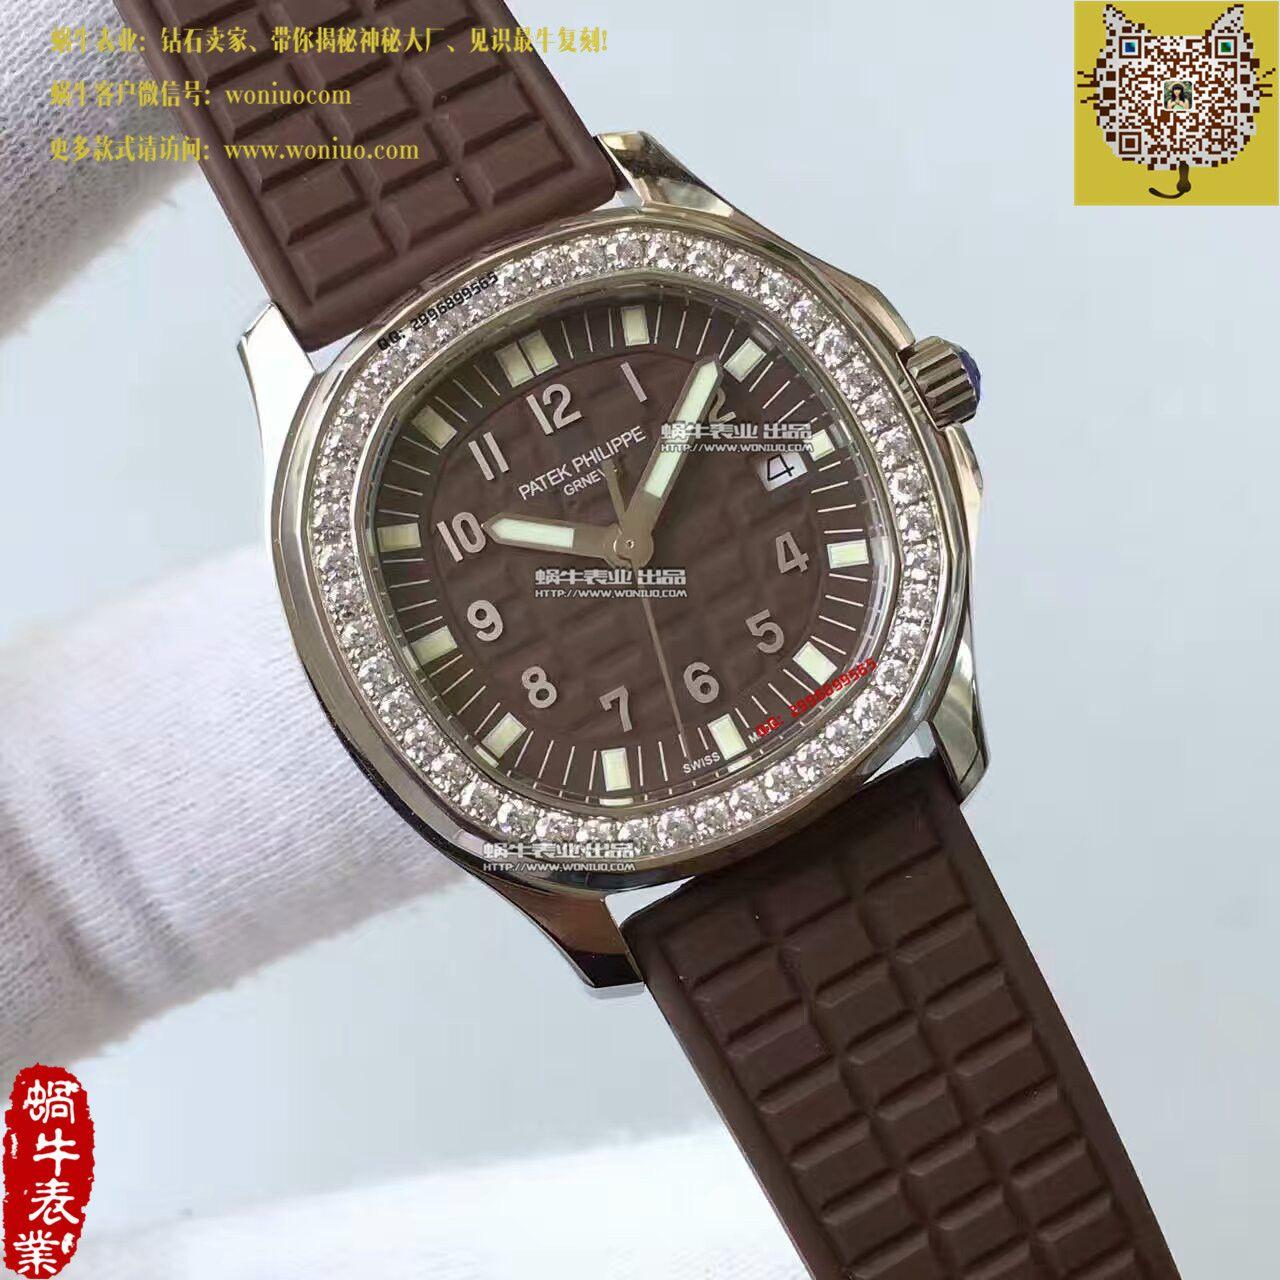 【BP厂1:1高仿手表】百达翡丽AQUANAUT系列5067A-023女士腕表